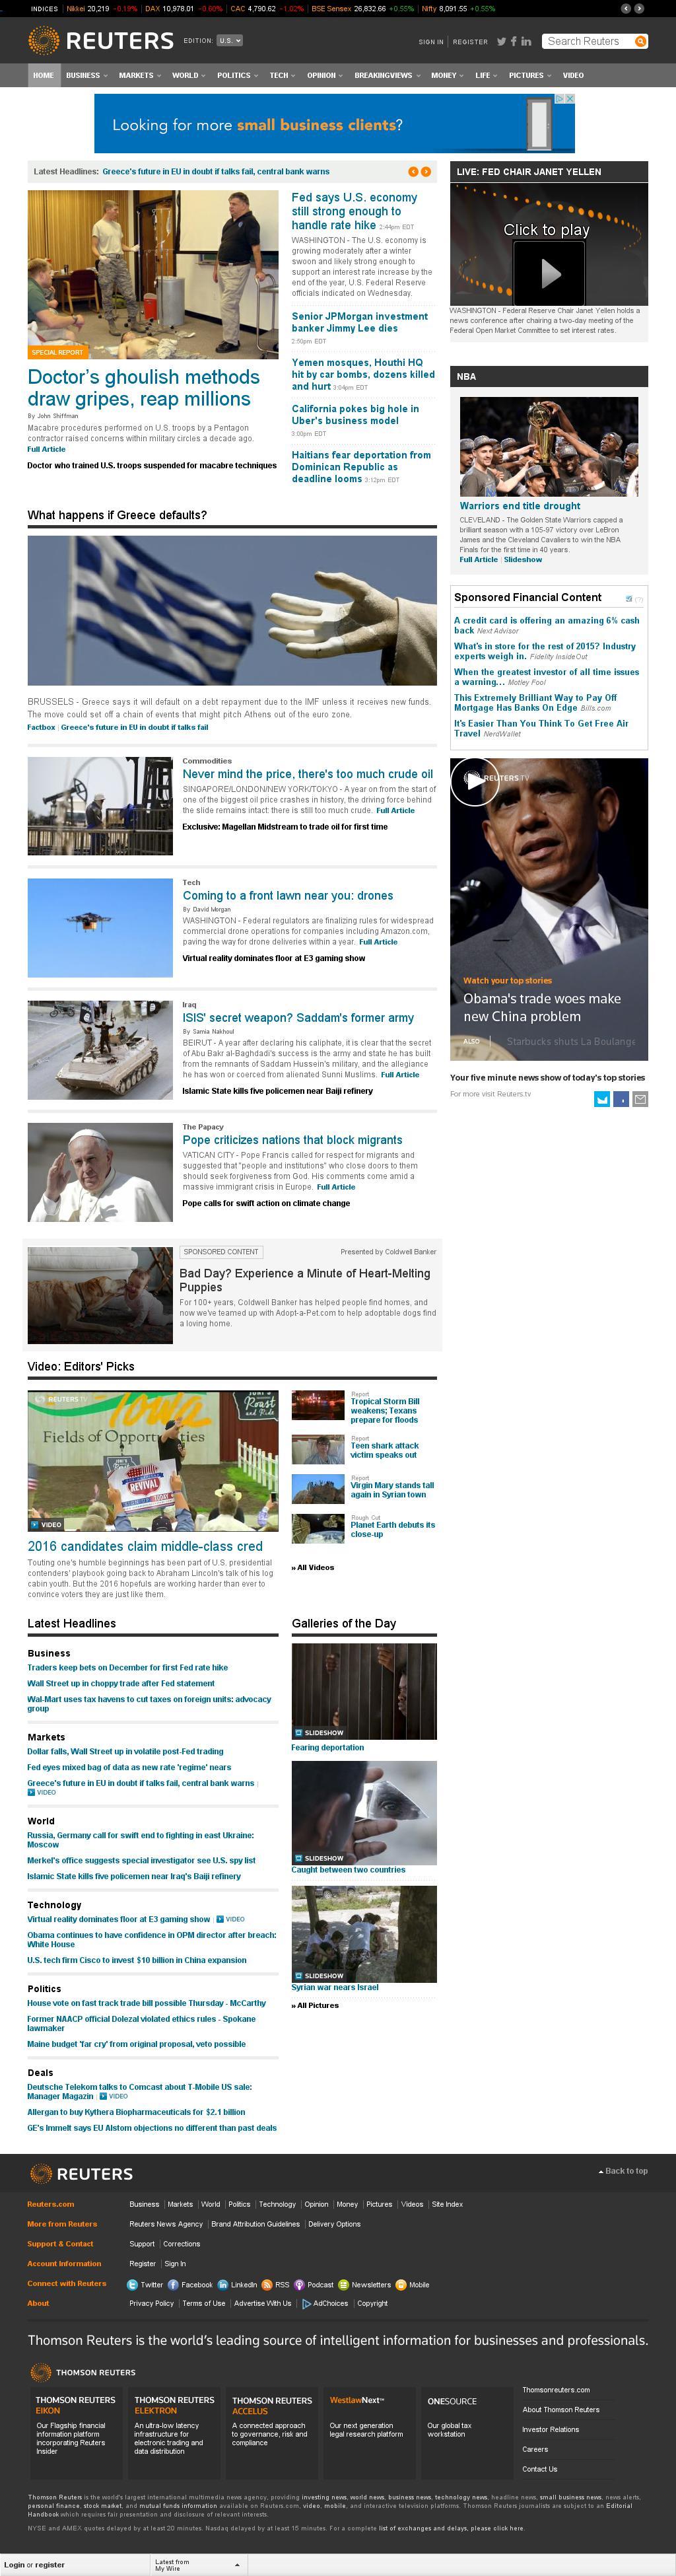 Reuters at Wednesday June 17, 2015, 7:20 p.m. UTC